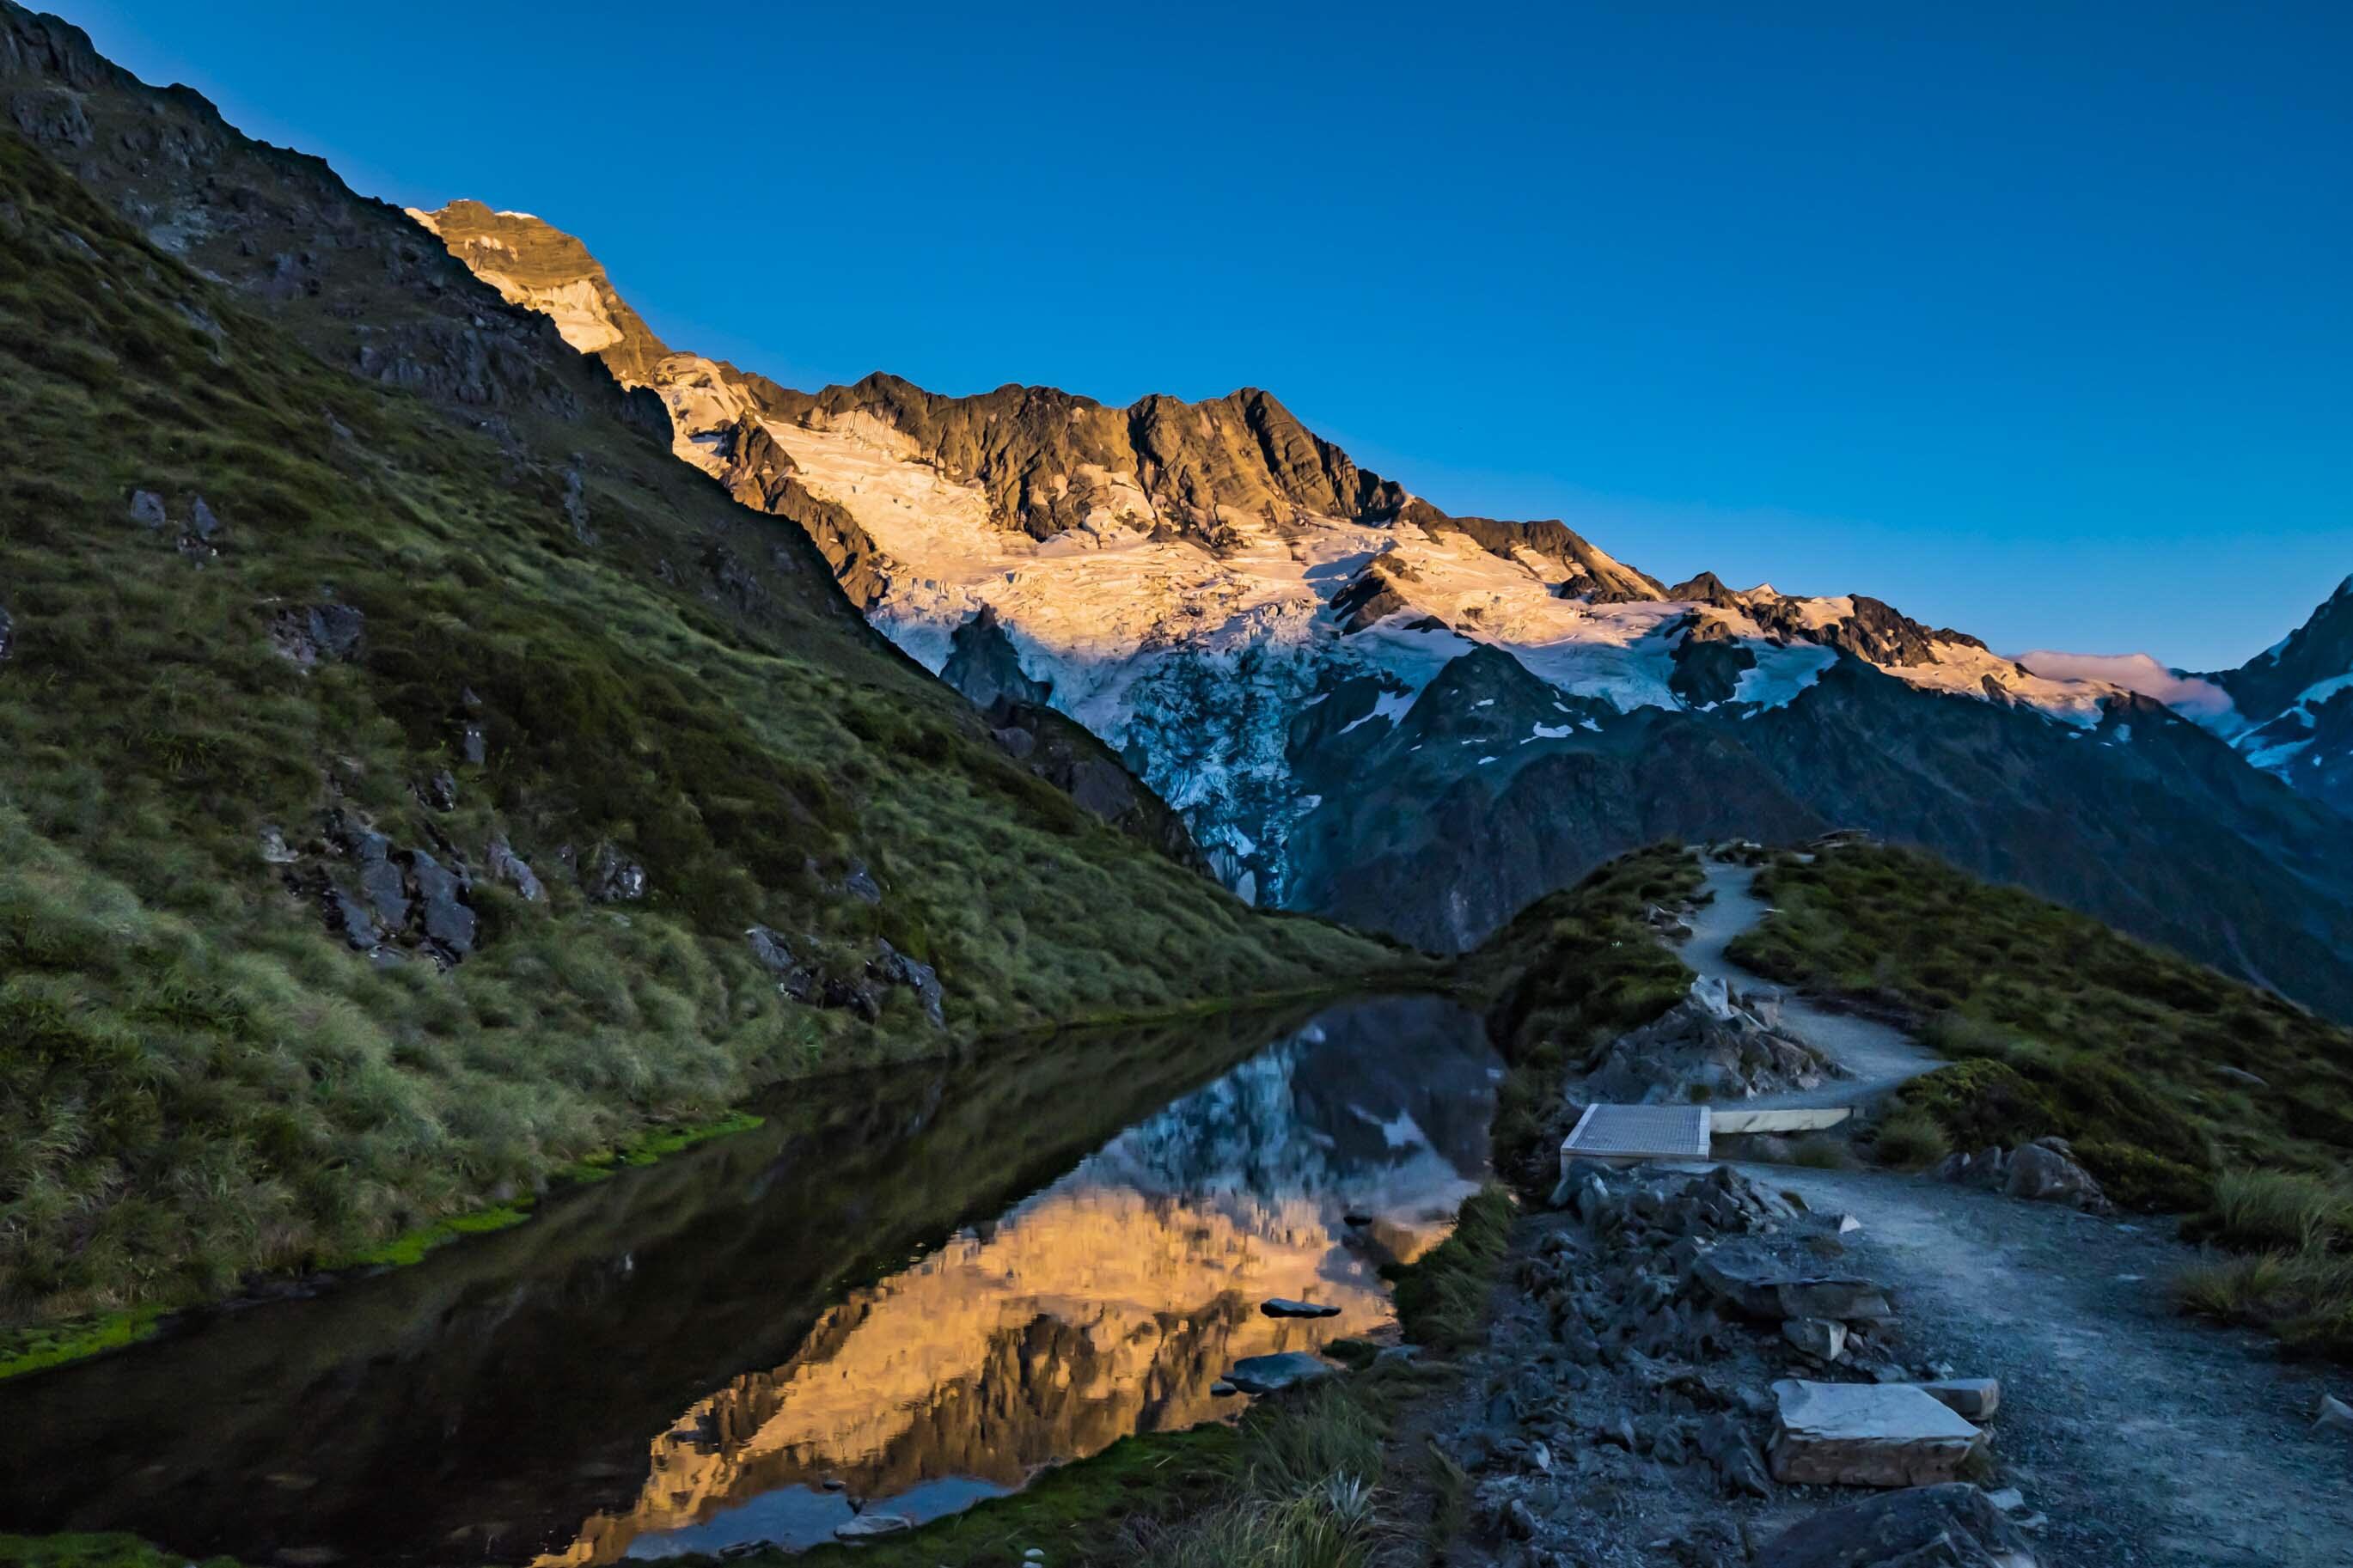 sunrise seen on glacier